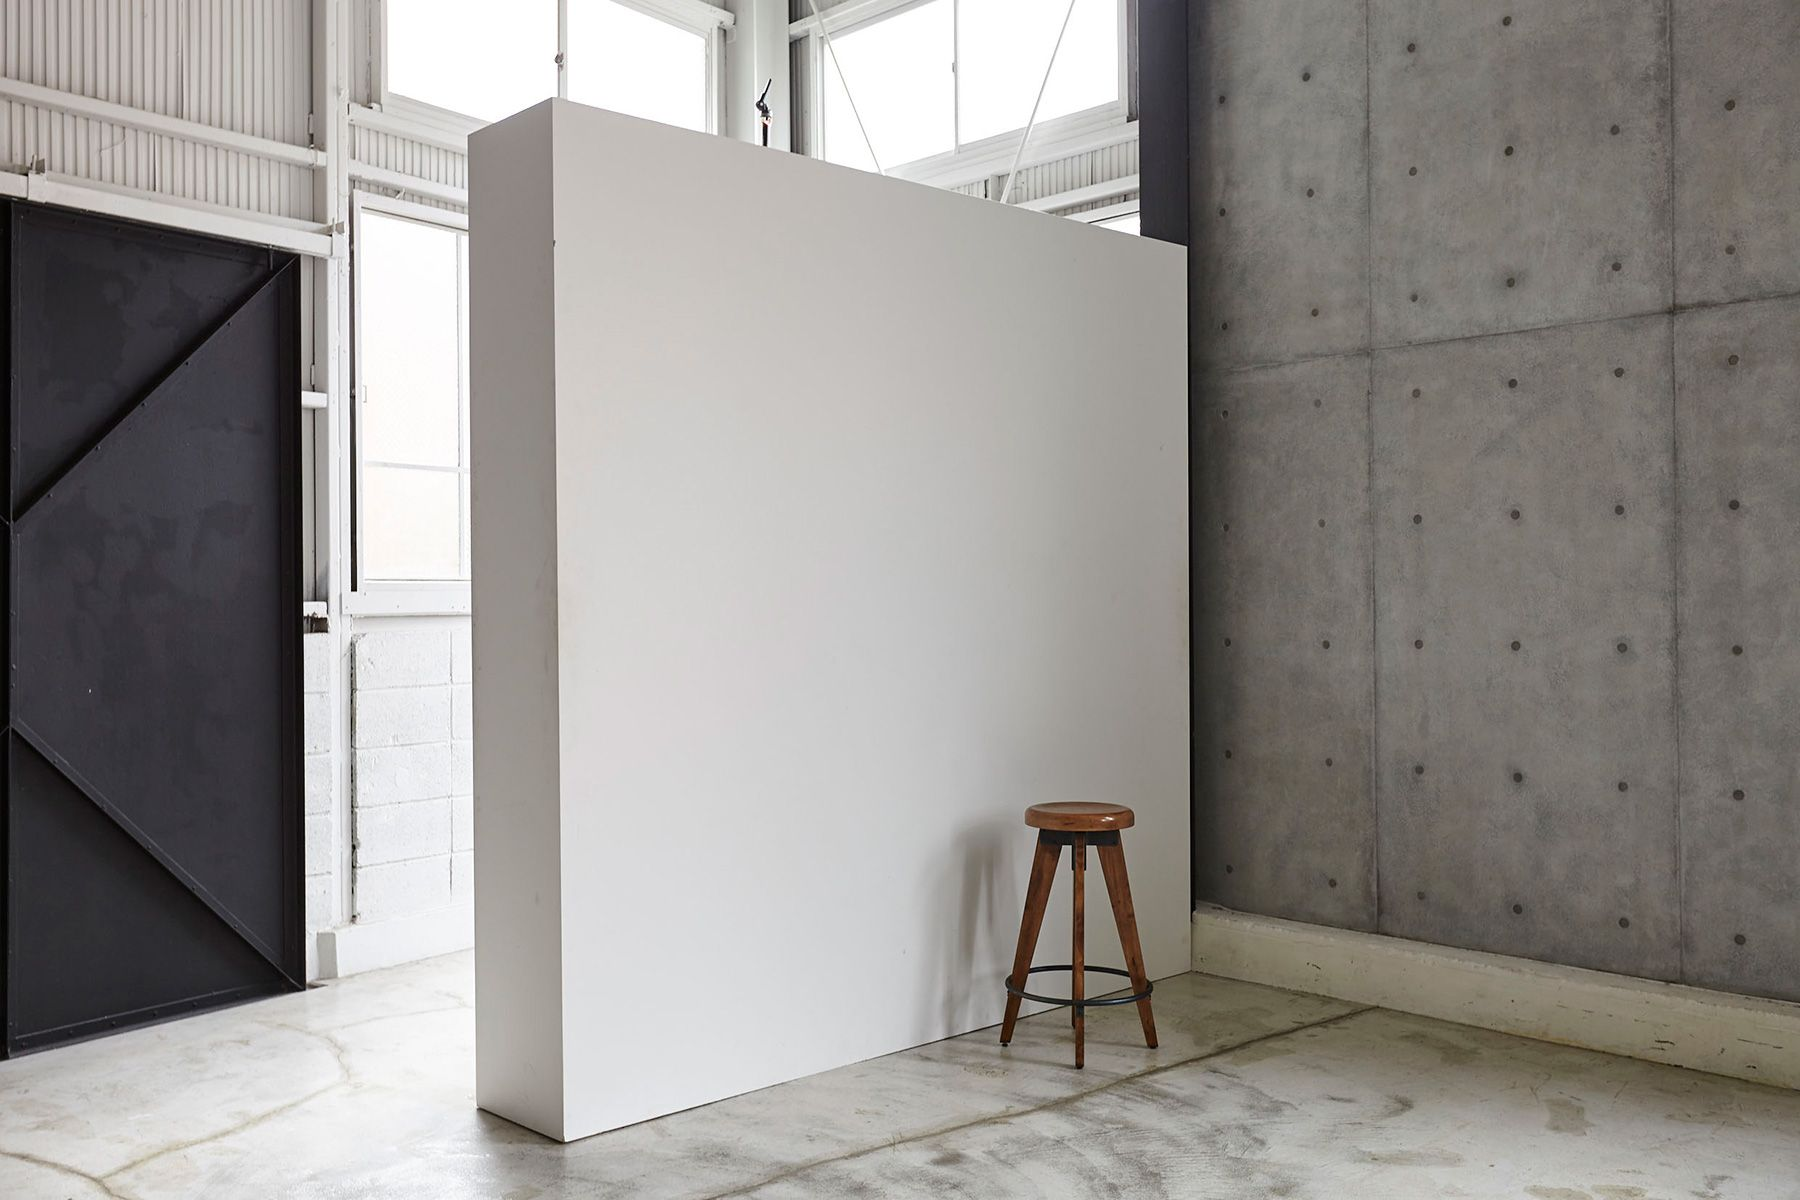 Studio I-AM (スタジオ アイアム)可動式壁